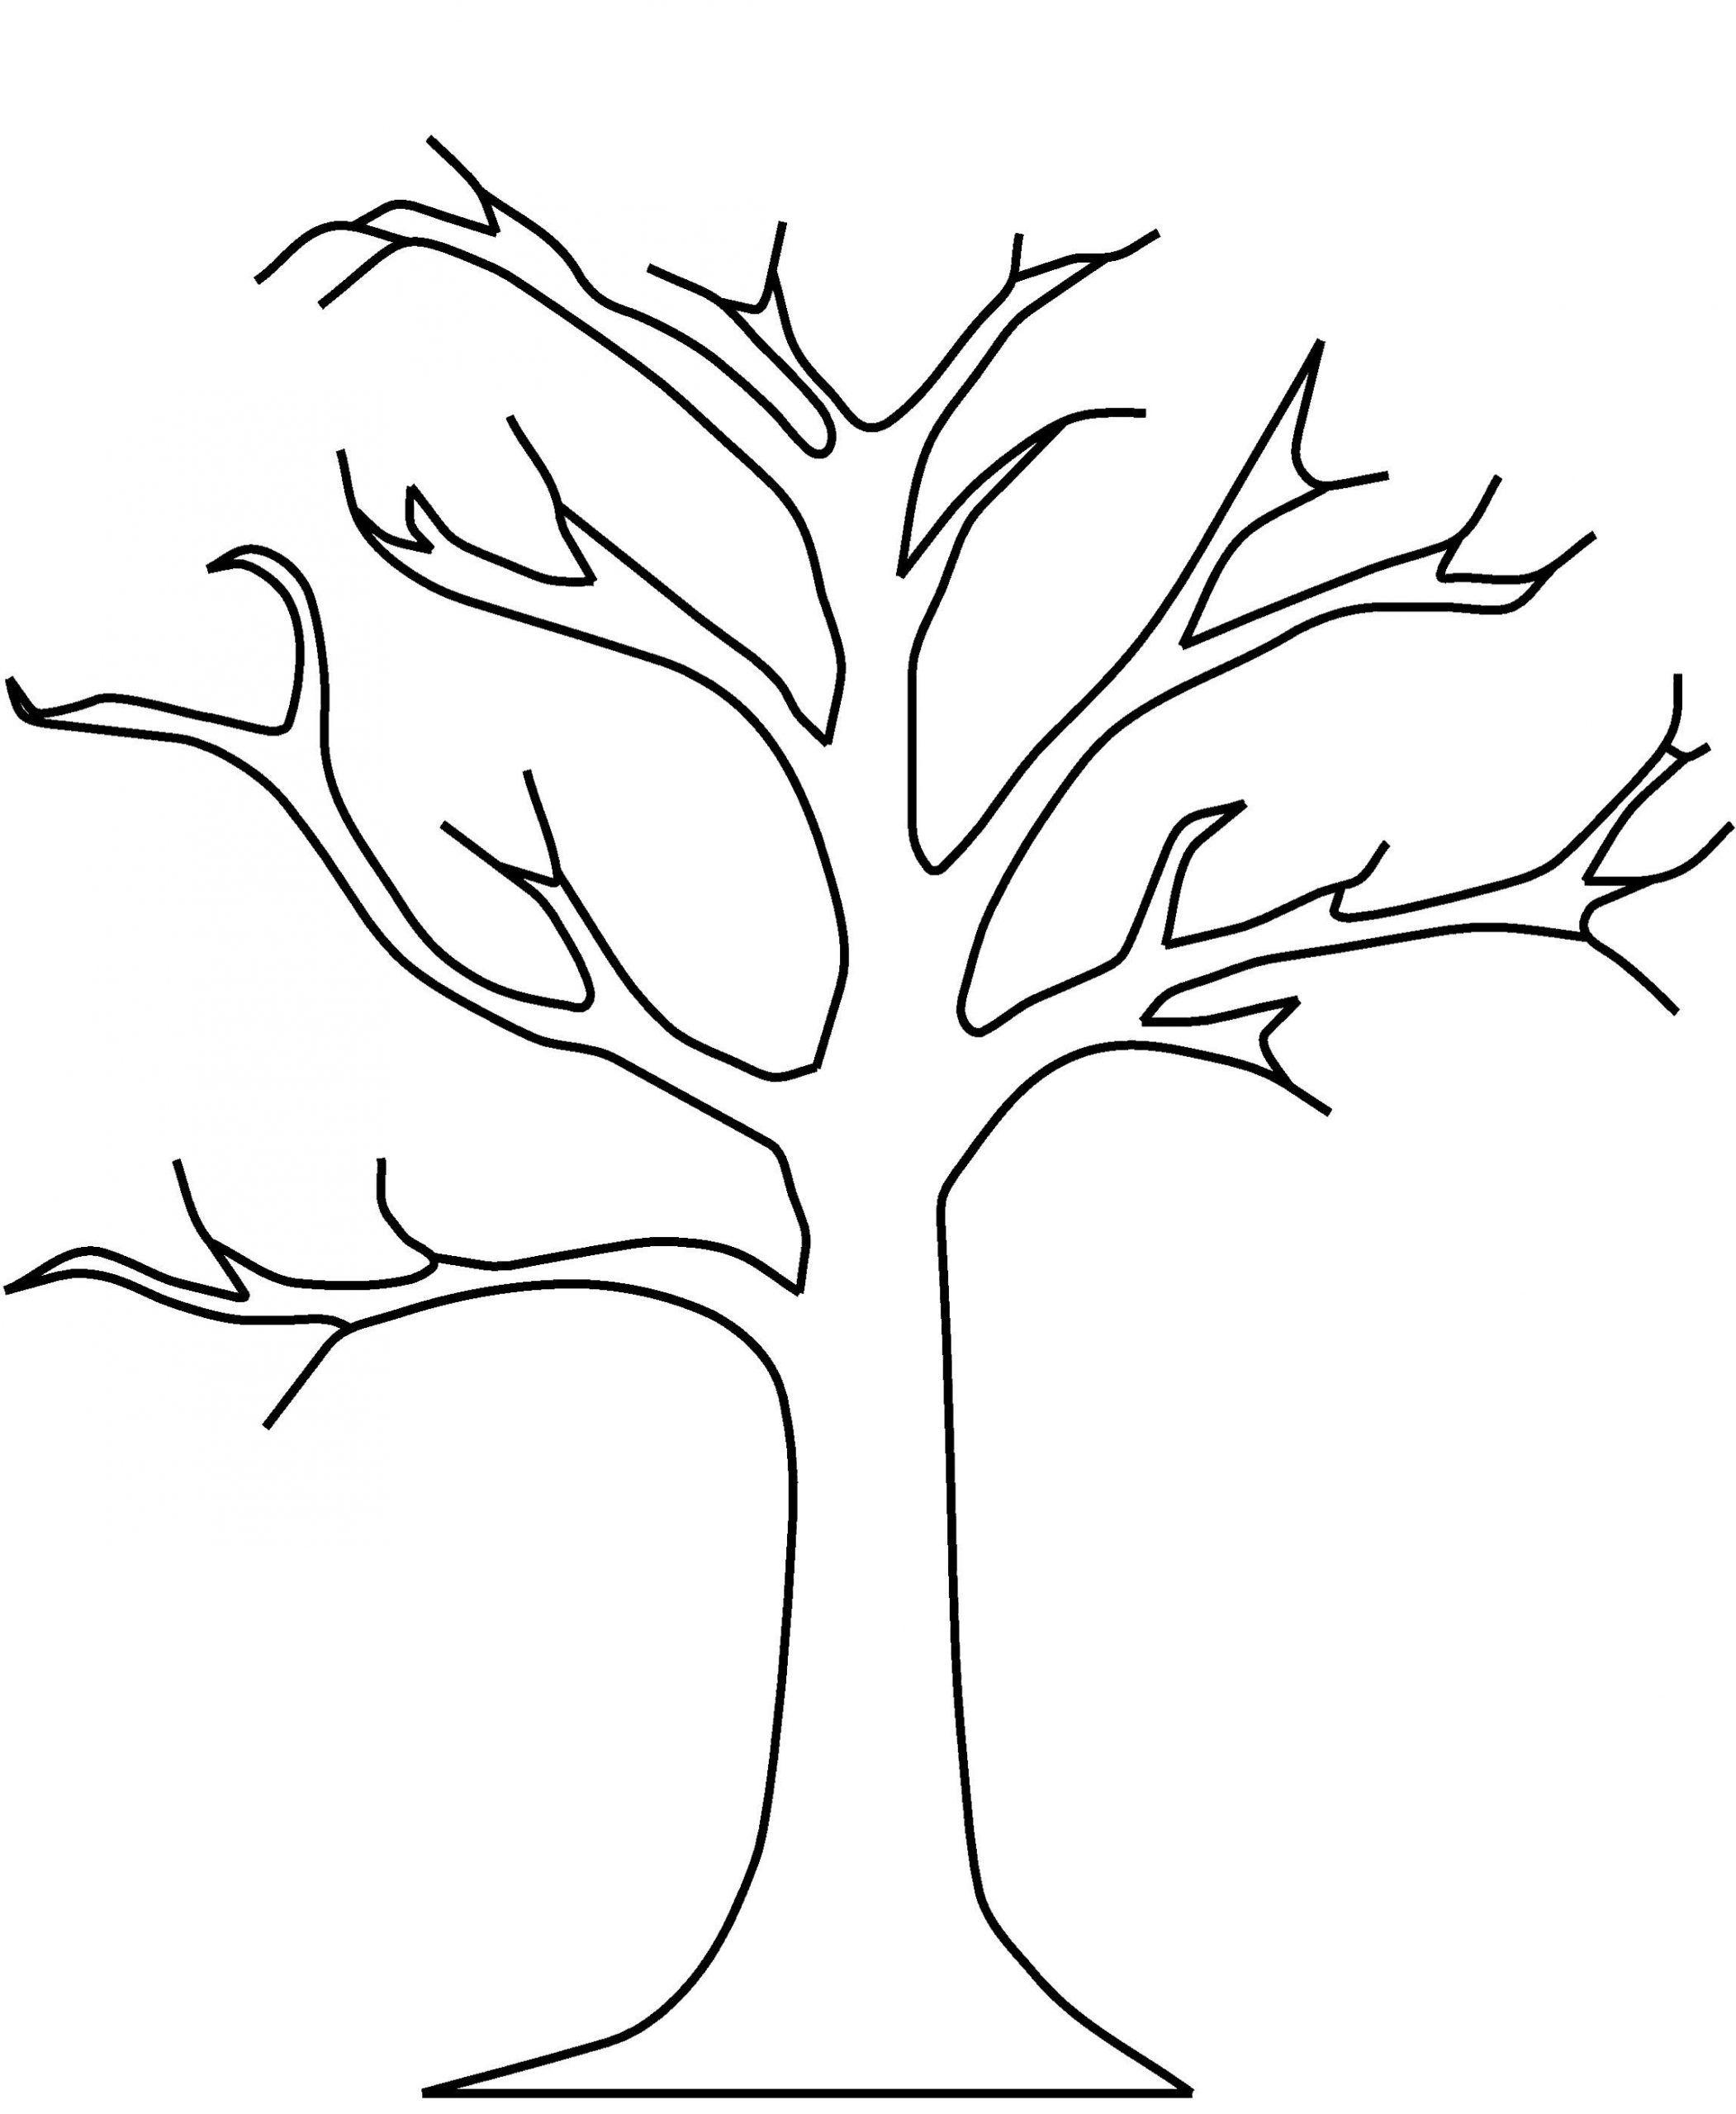 Malvorlage Baum Kostenlos 12 #art #simple #drawings#art #baum